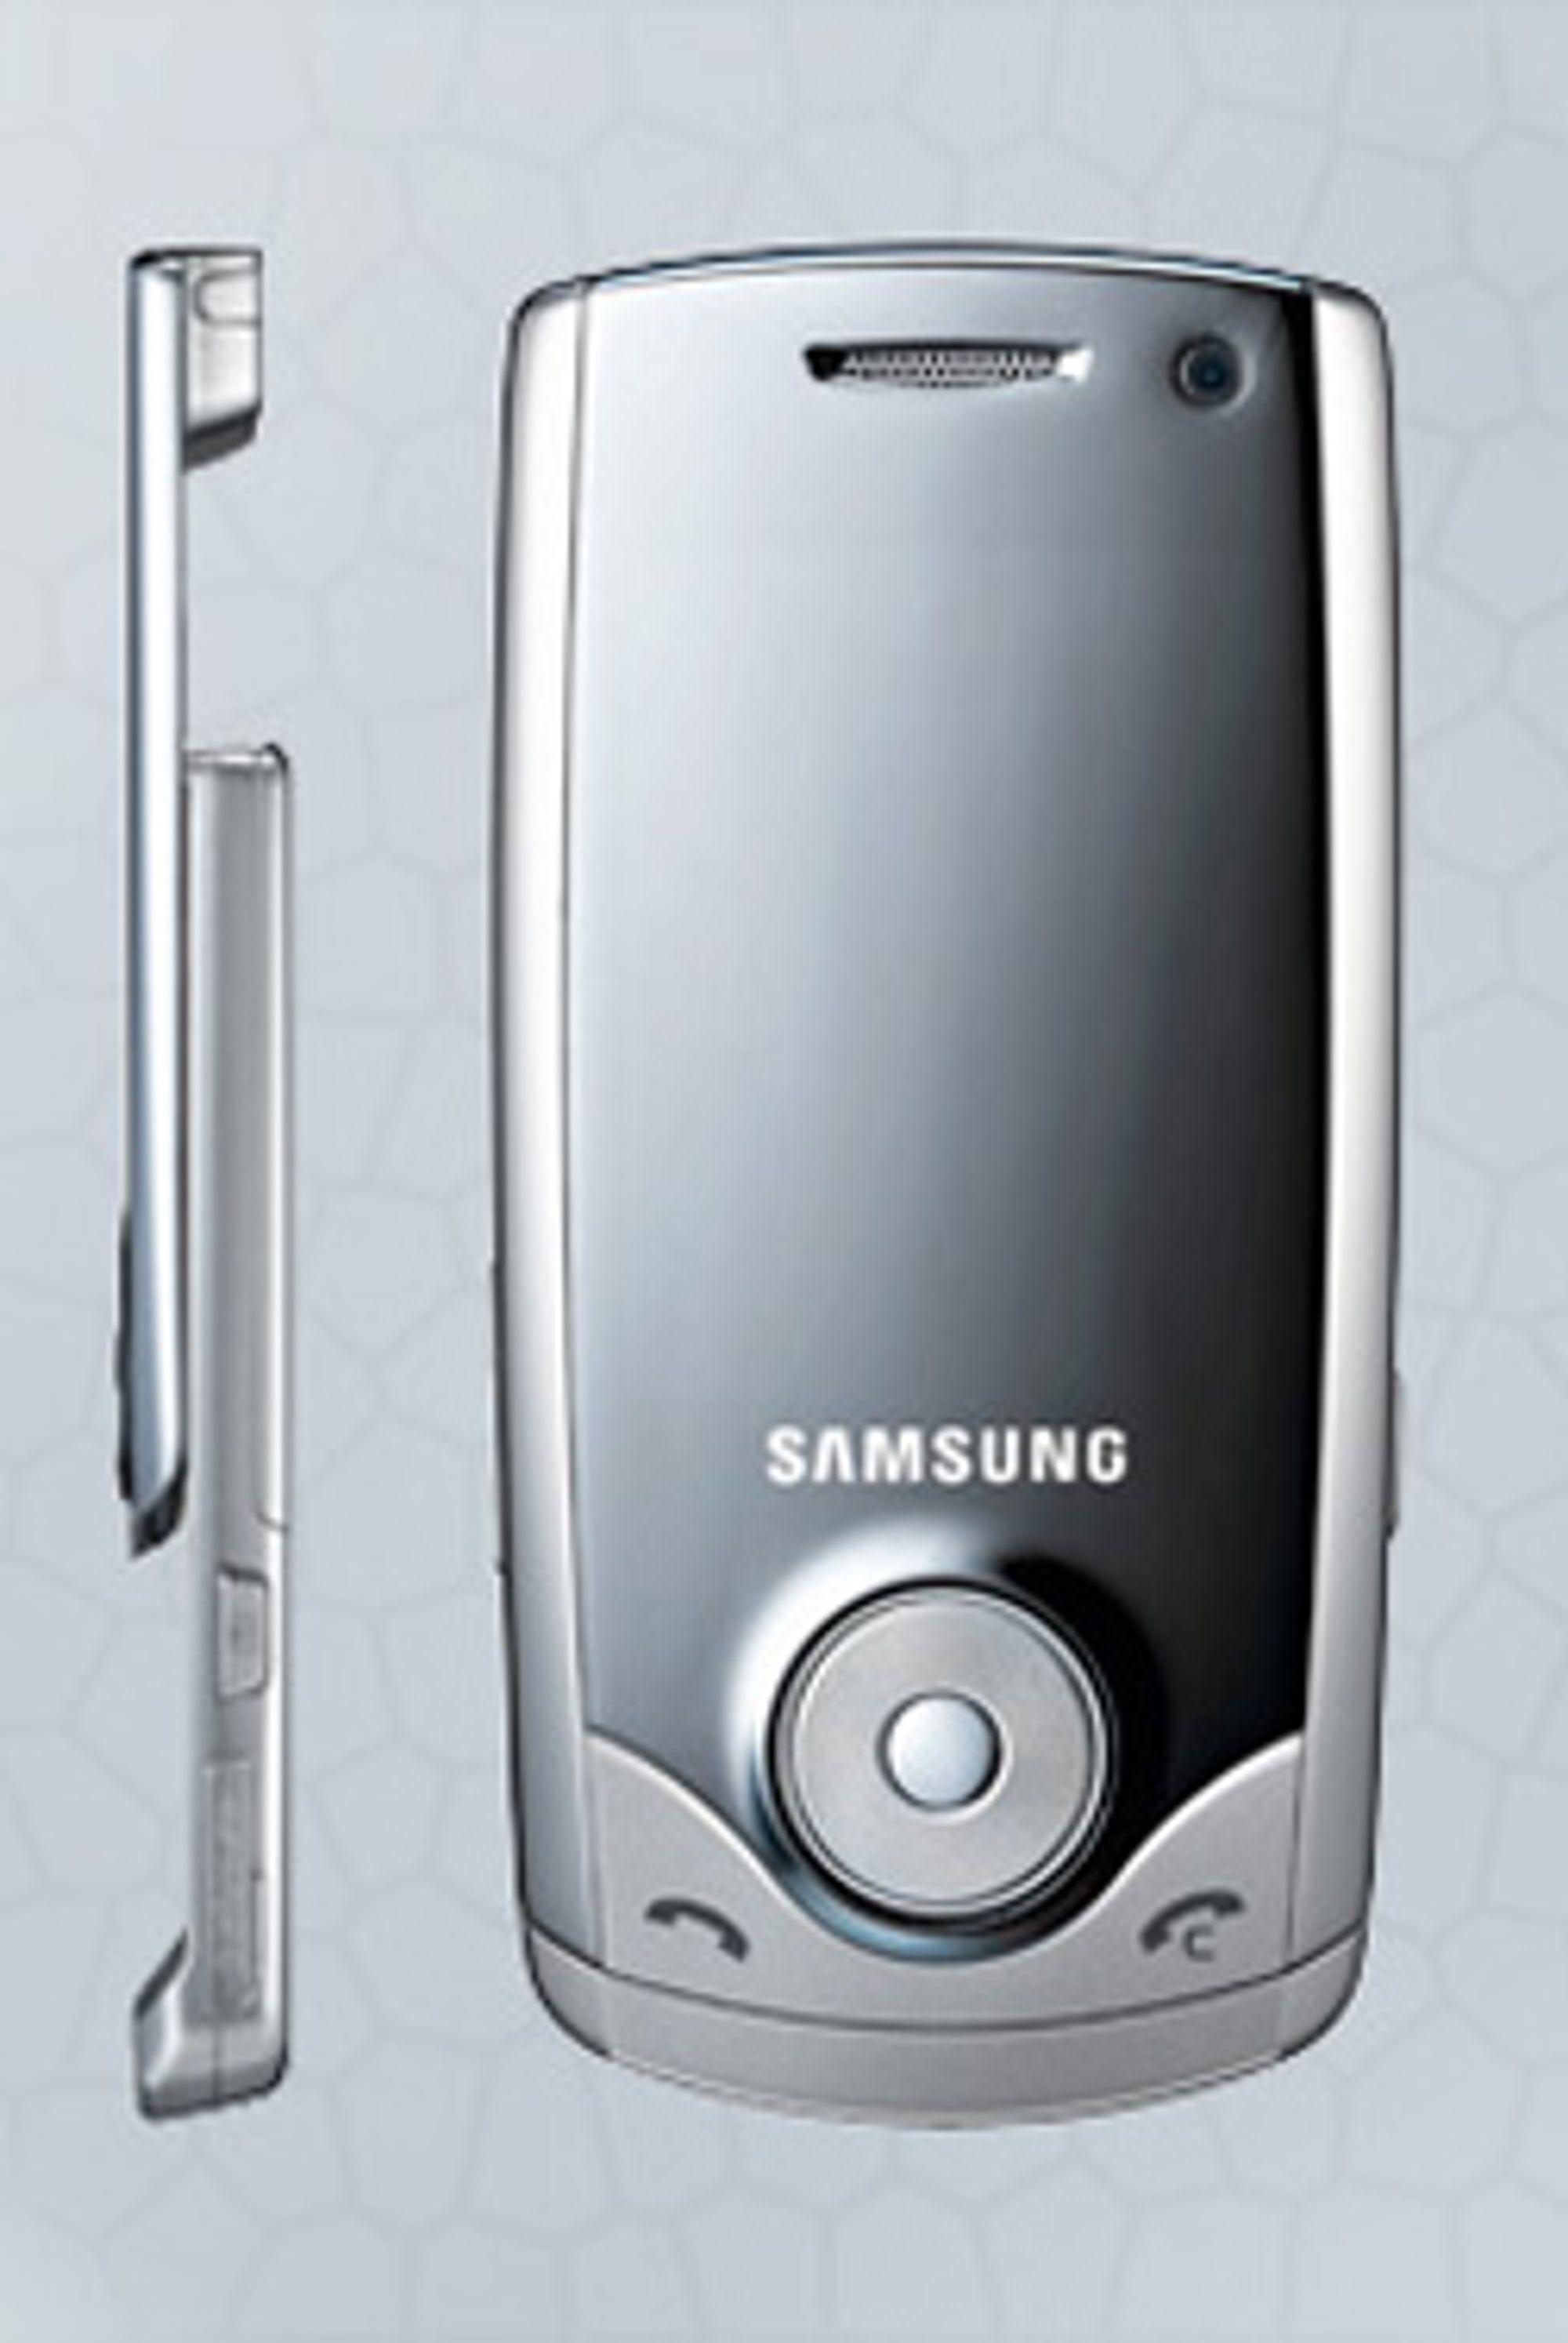 Samsungs U600 falt i smak hos EISA. (Foto: Samsung)